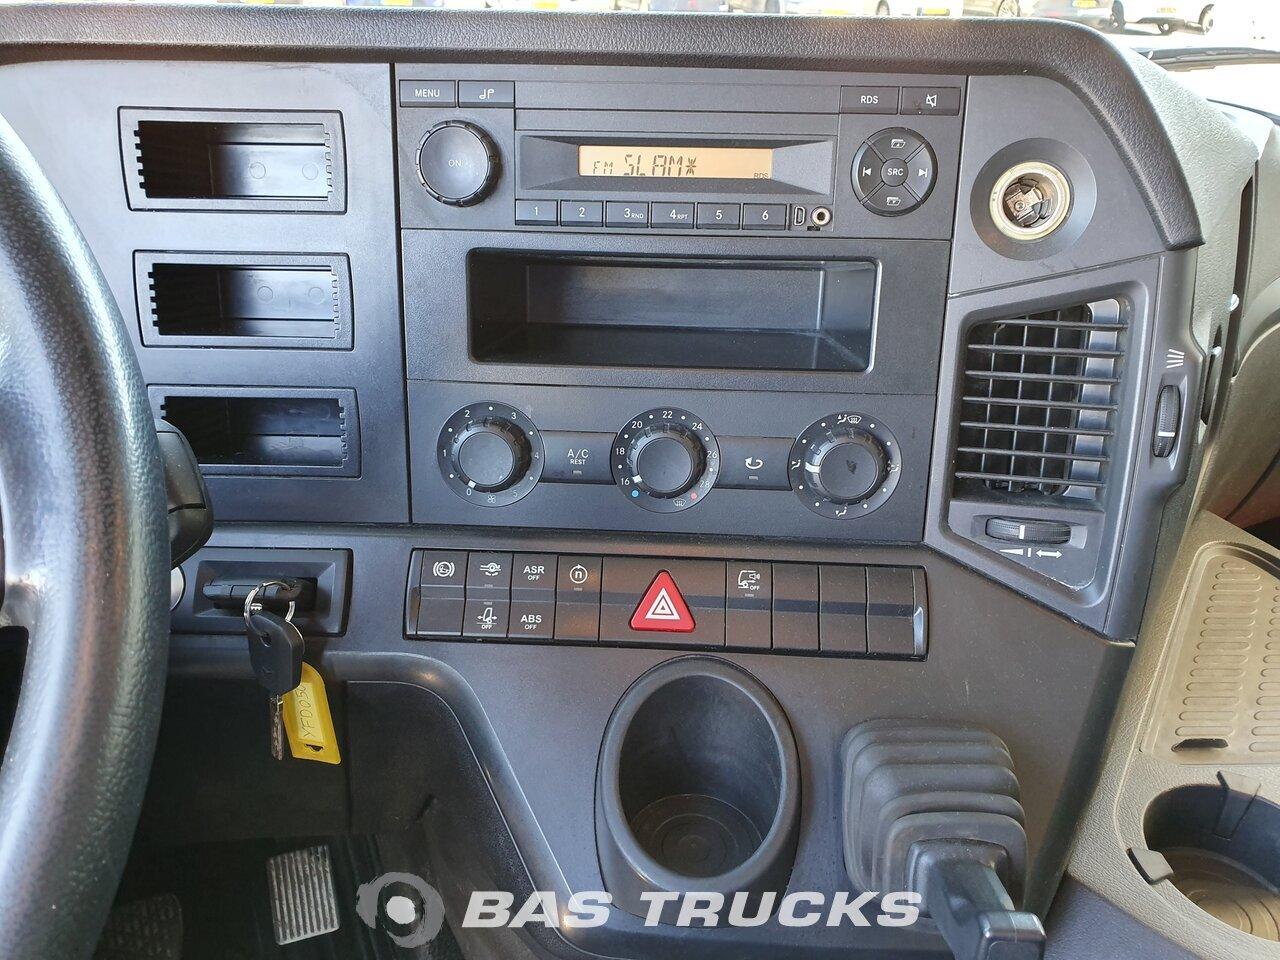 For sale at BAS Trucks: Mercedes Arocs 3240 B 8X4 03/2017